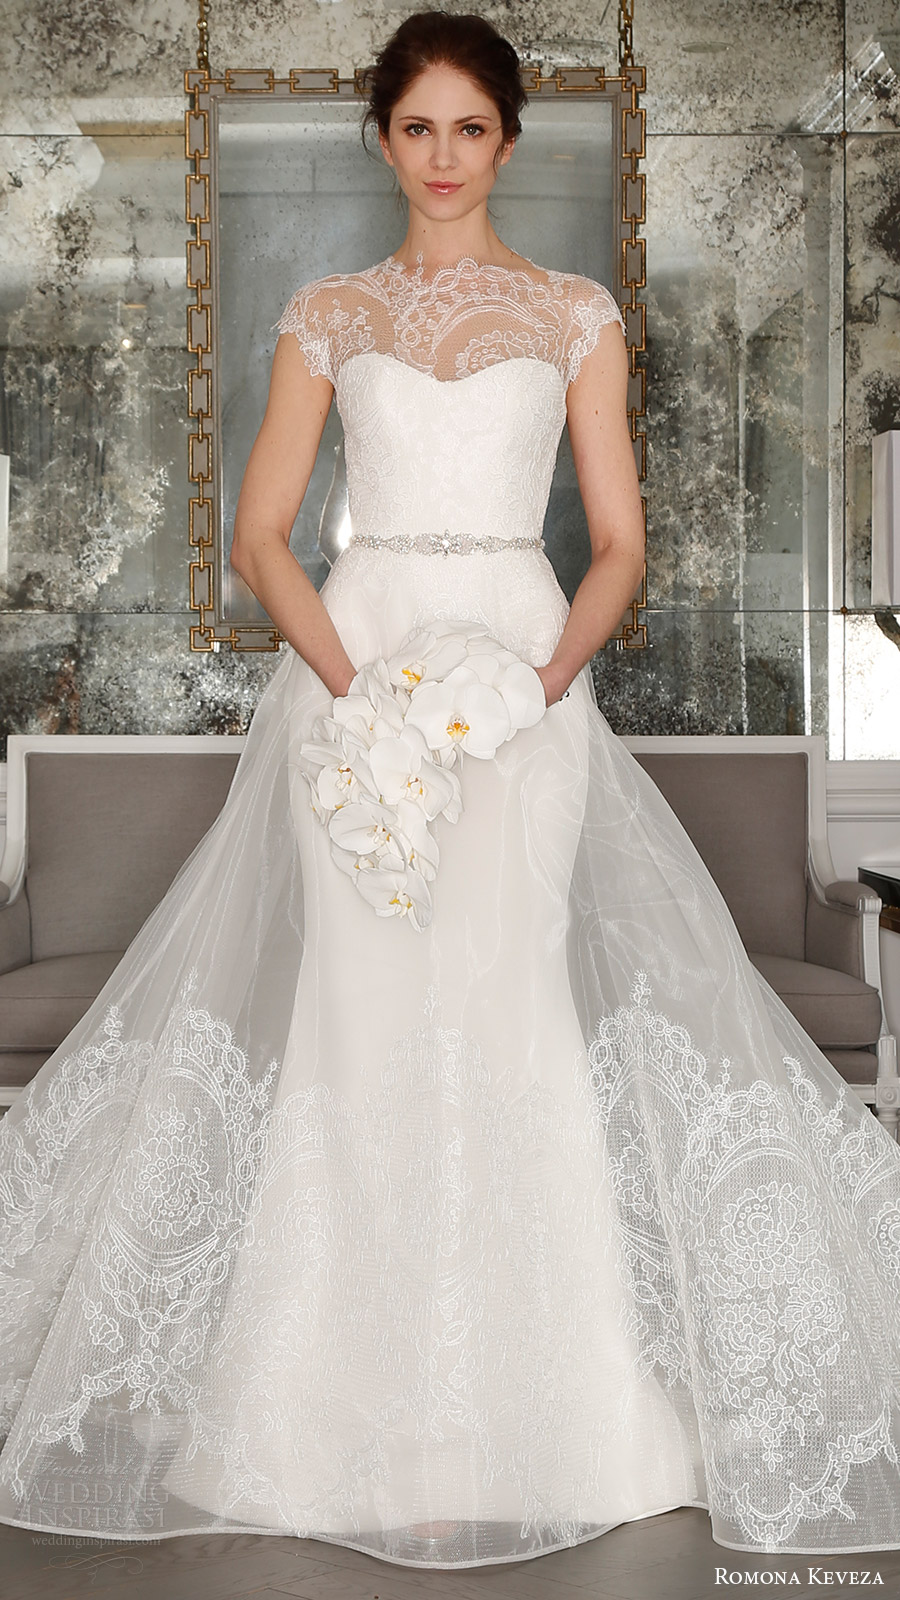 romona keveza bridal spring 2017 cap sleeves sweetheart illusion high neck sheath wedding dress (rk7404) mv optional sheer aline overskirt